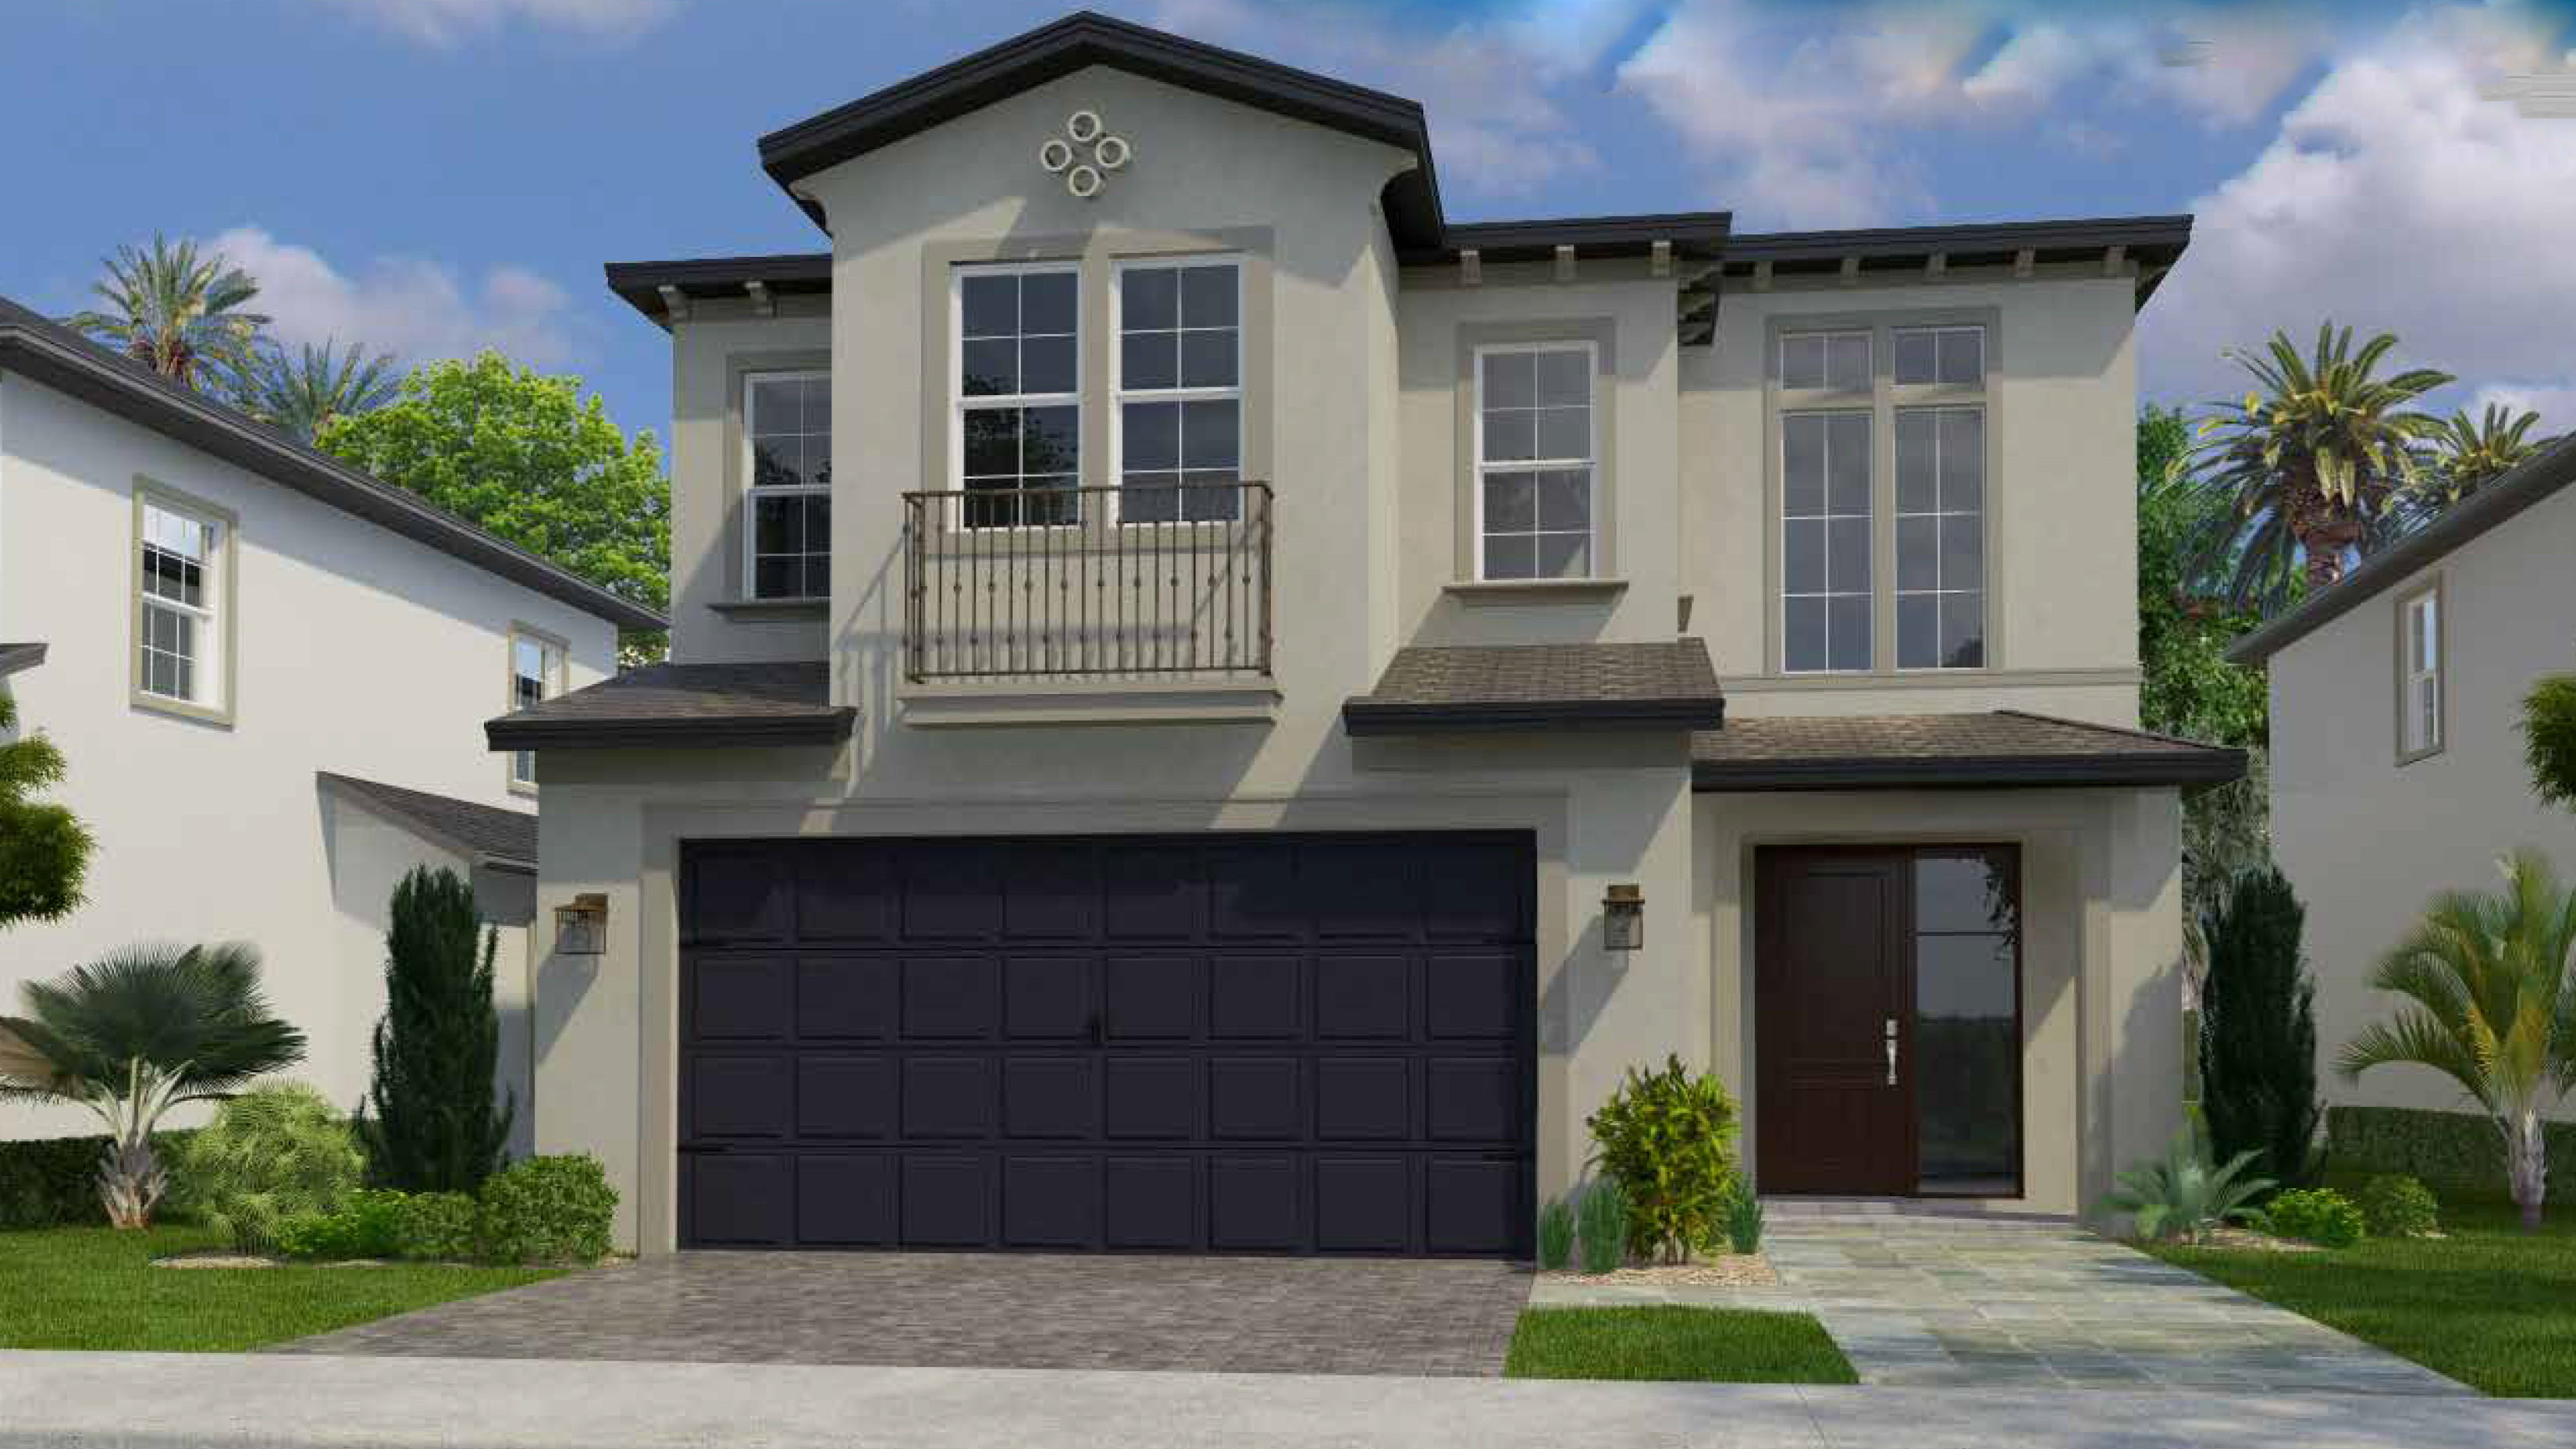 Cantaina Home | Modern Home Designs in Orlando, FL